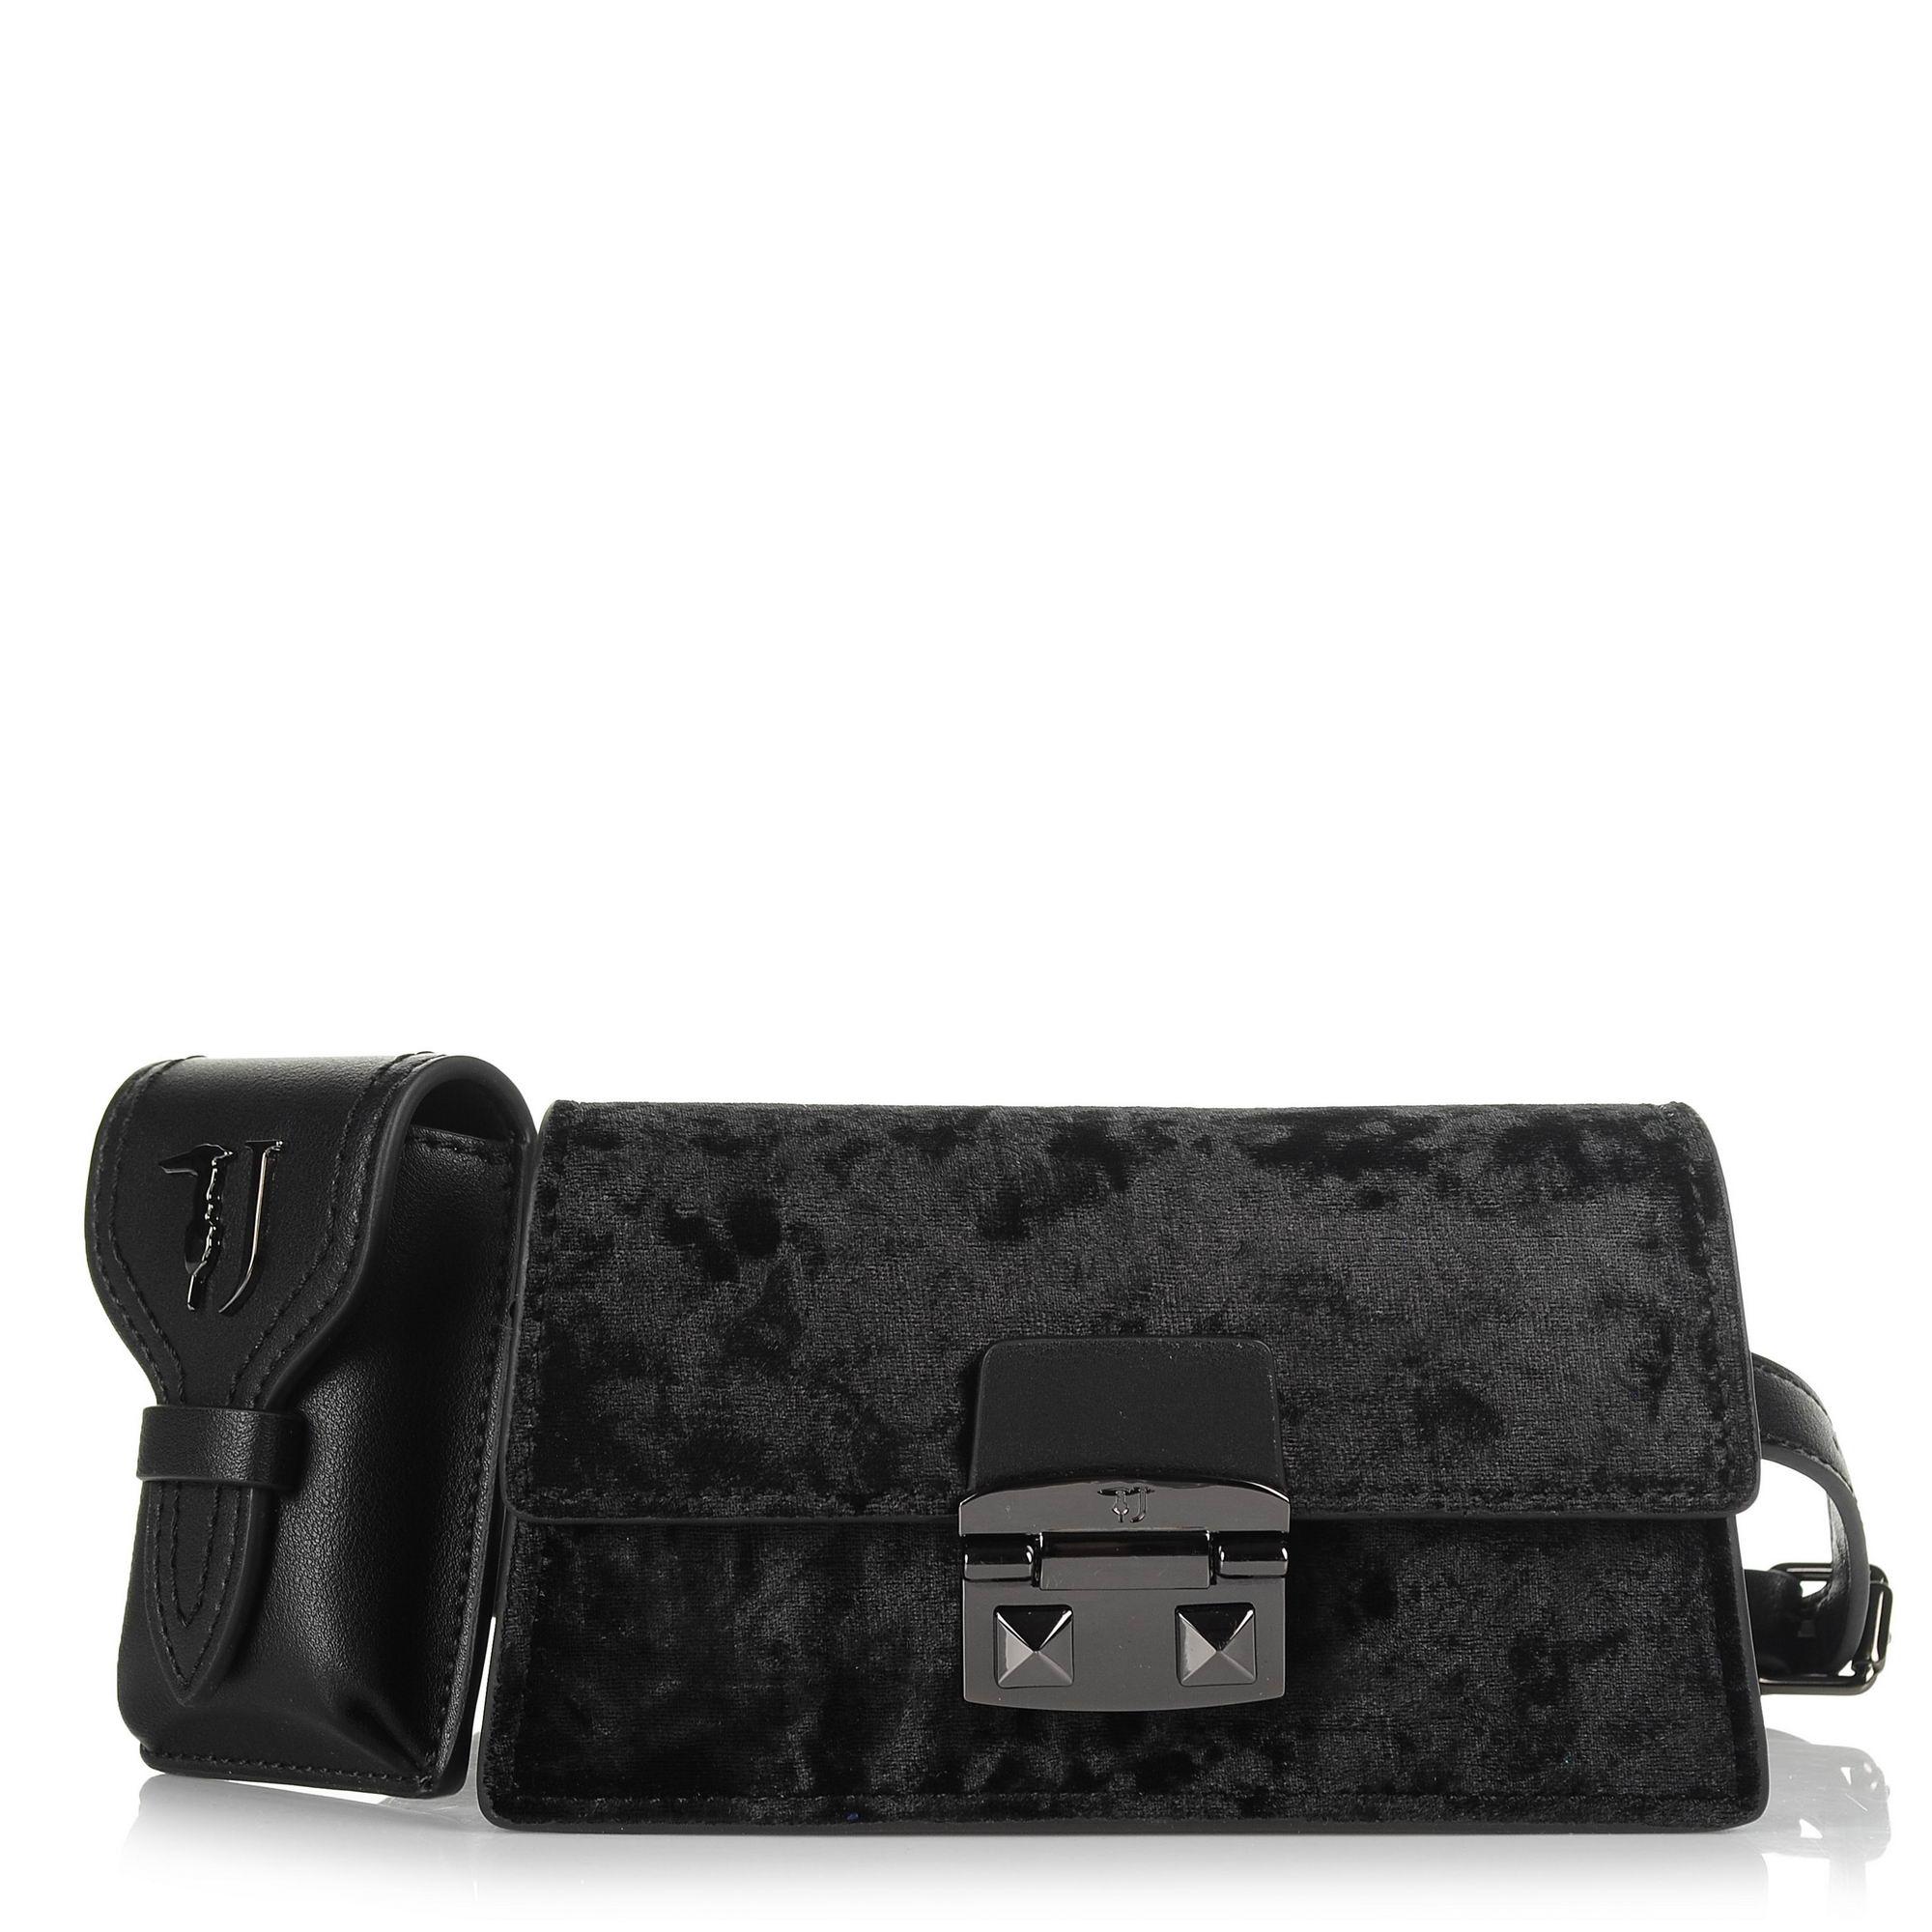 8a619cd775 Τσαντάκι Μέσης-Χιαστί Trussardi Jeans Coriandolo Belt Bag Ecoleather Velvet  75W0